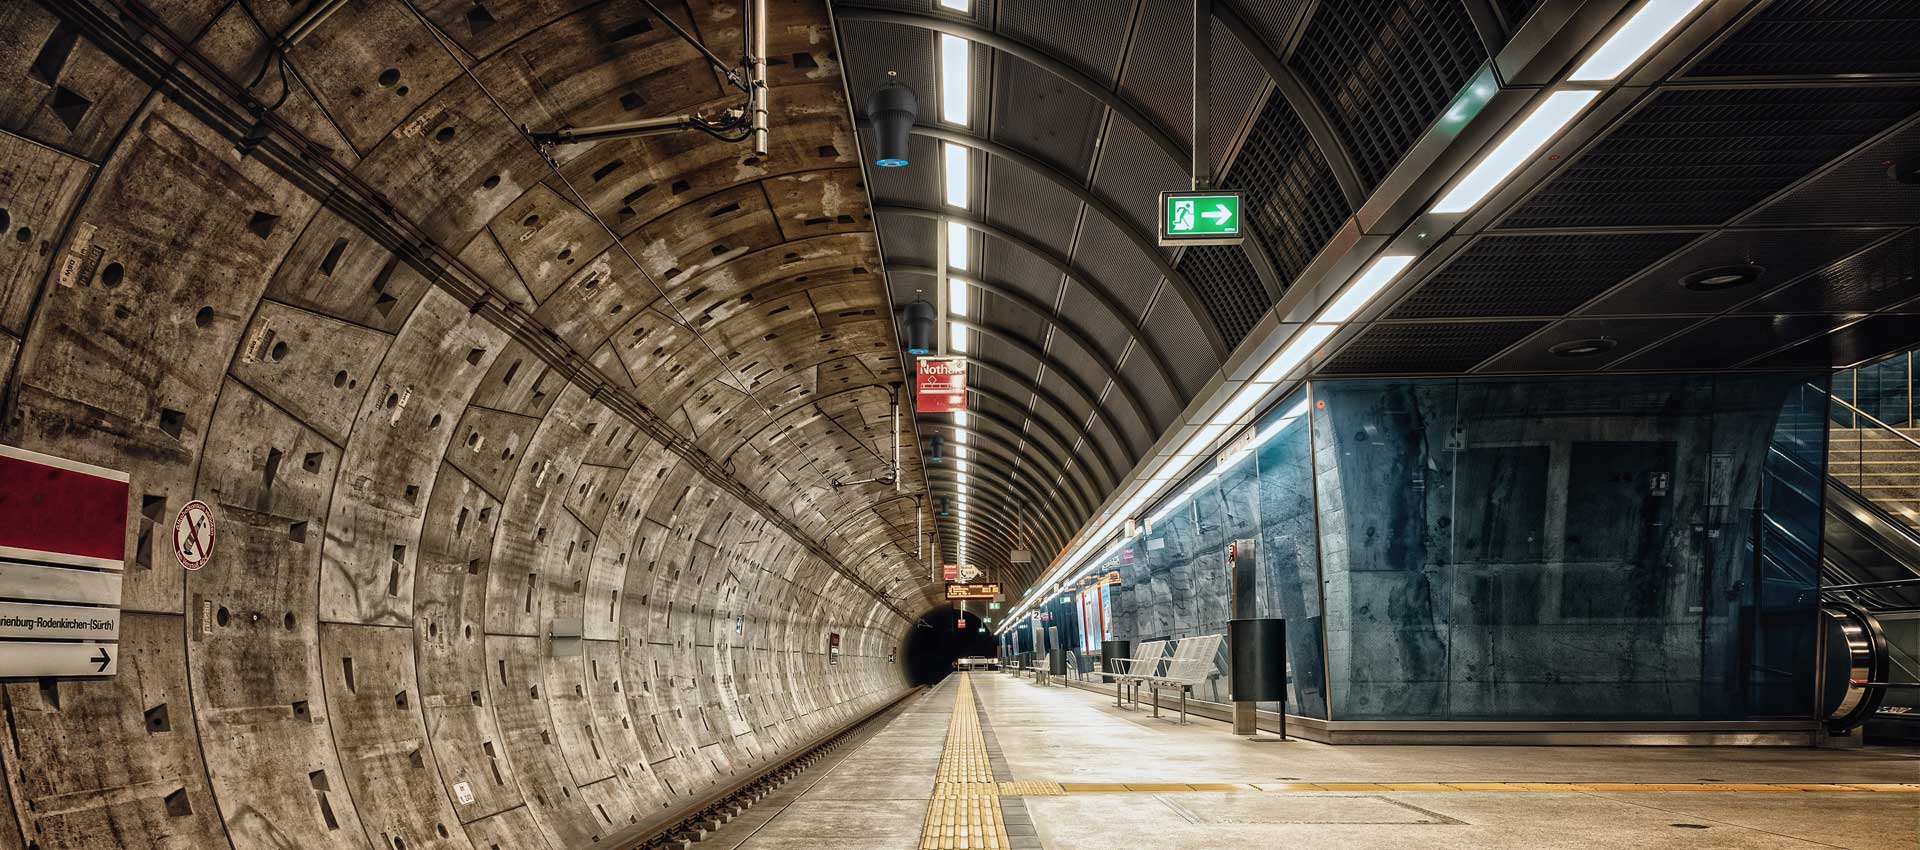 Airius PureAir Air Purification System Installed In Subway Underground